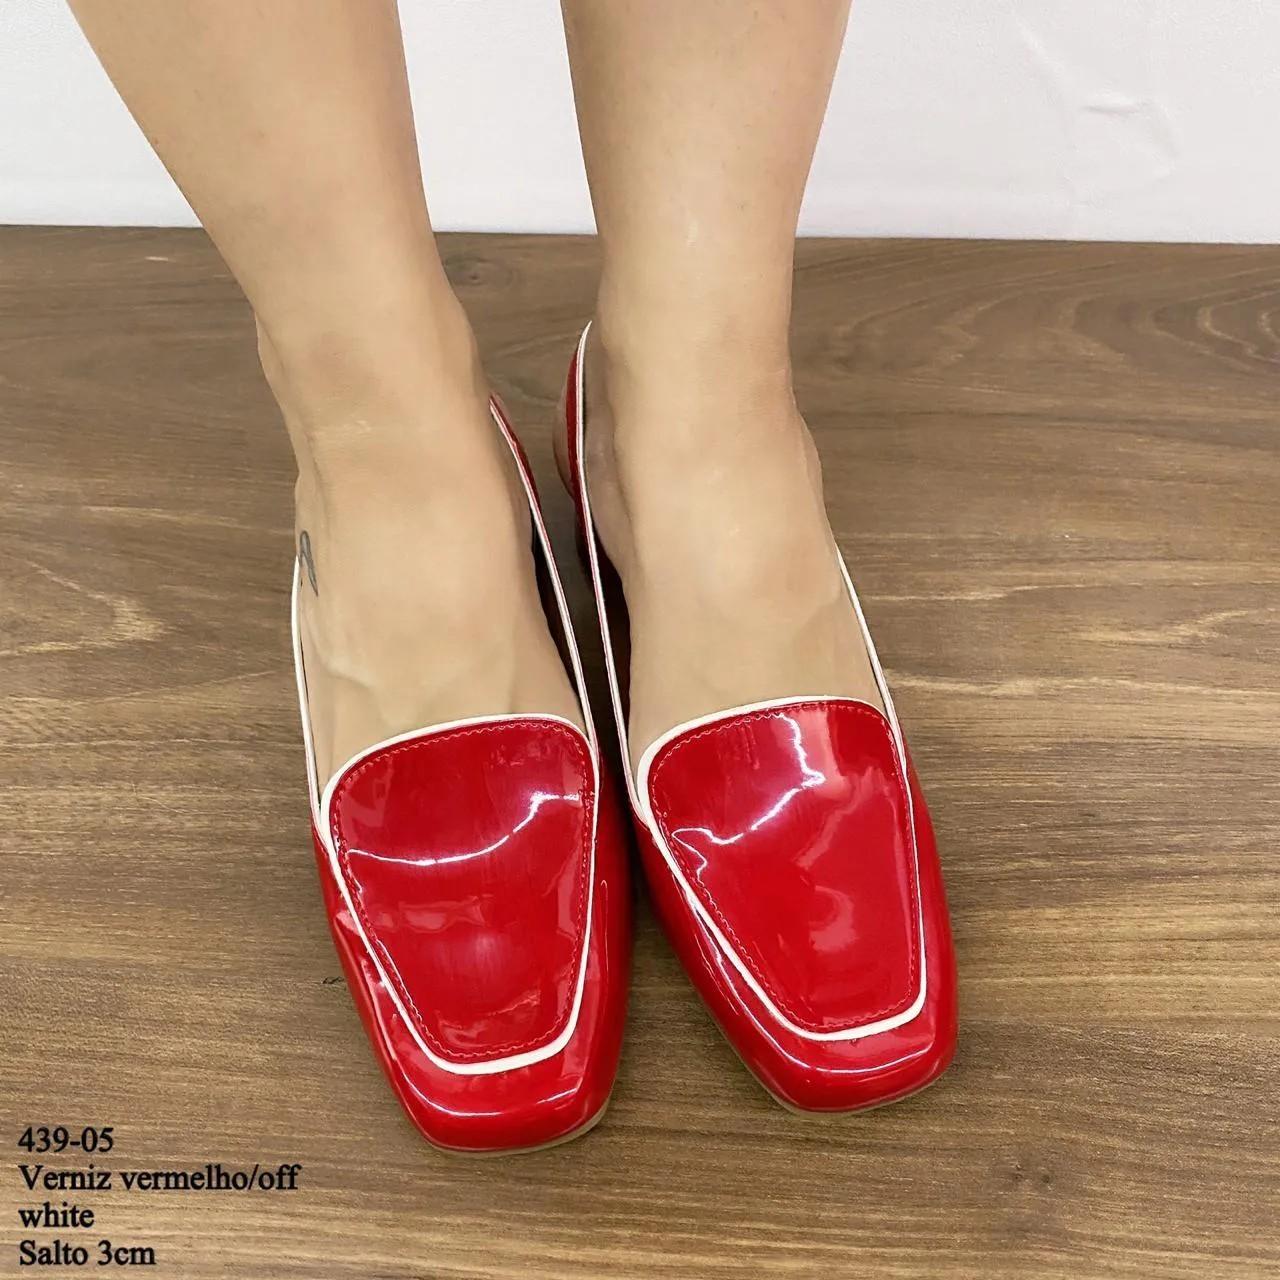 Chanel Vermelho Verniz | D-439-05